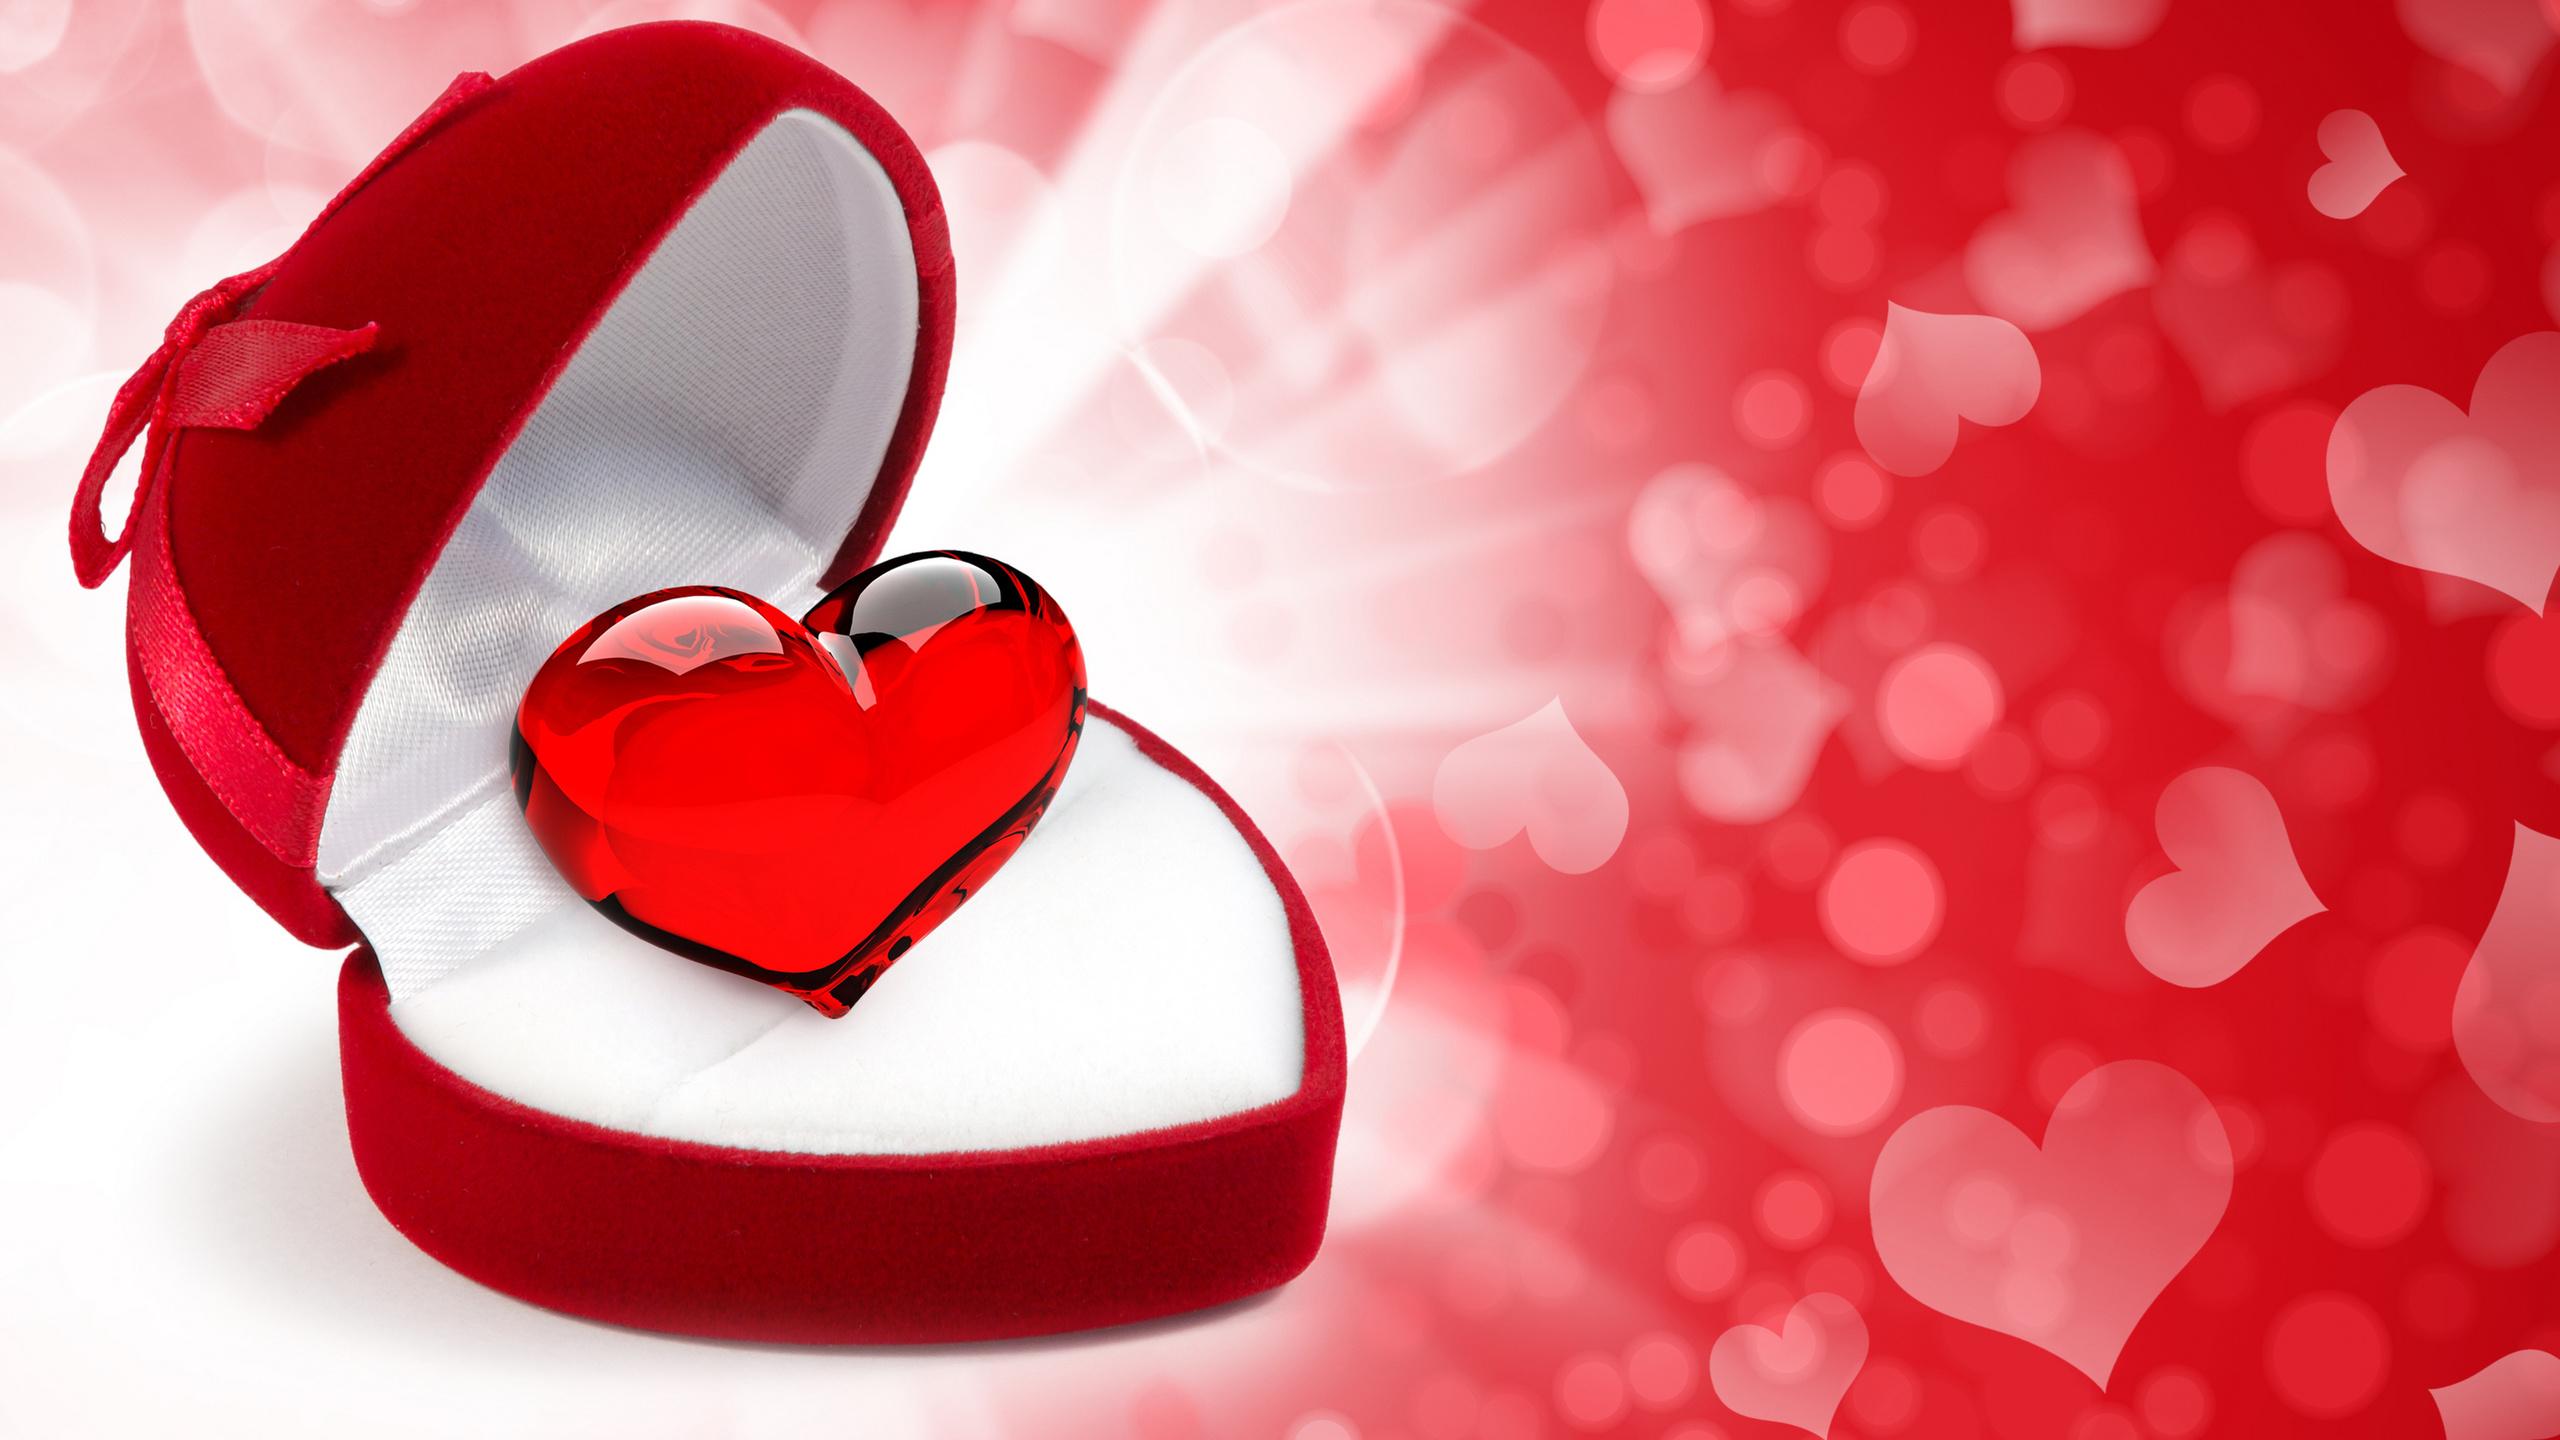 Смотреть онлайн картинки сердечек